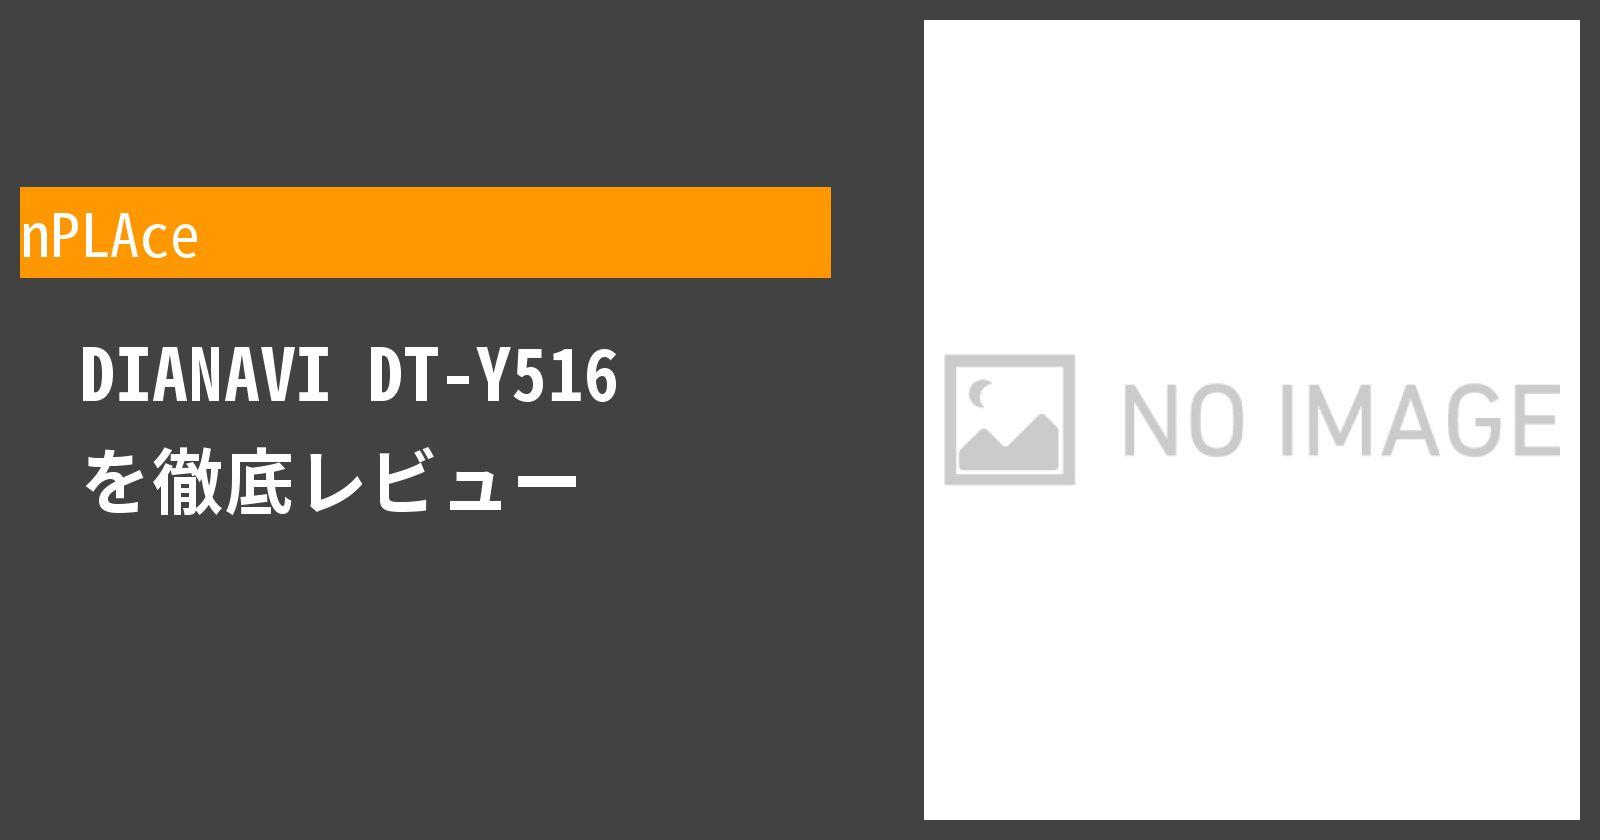 DIANAVI DT-Y516を徹底評価